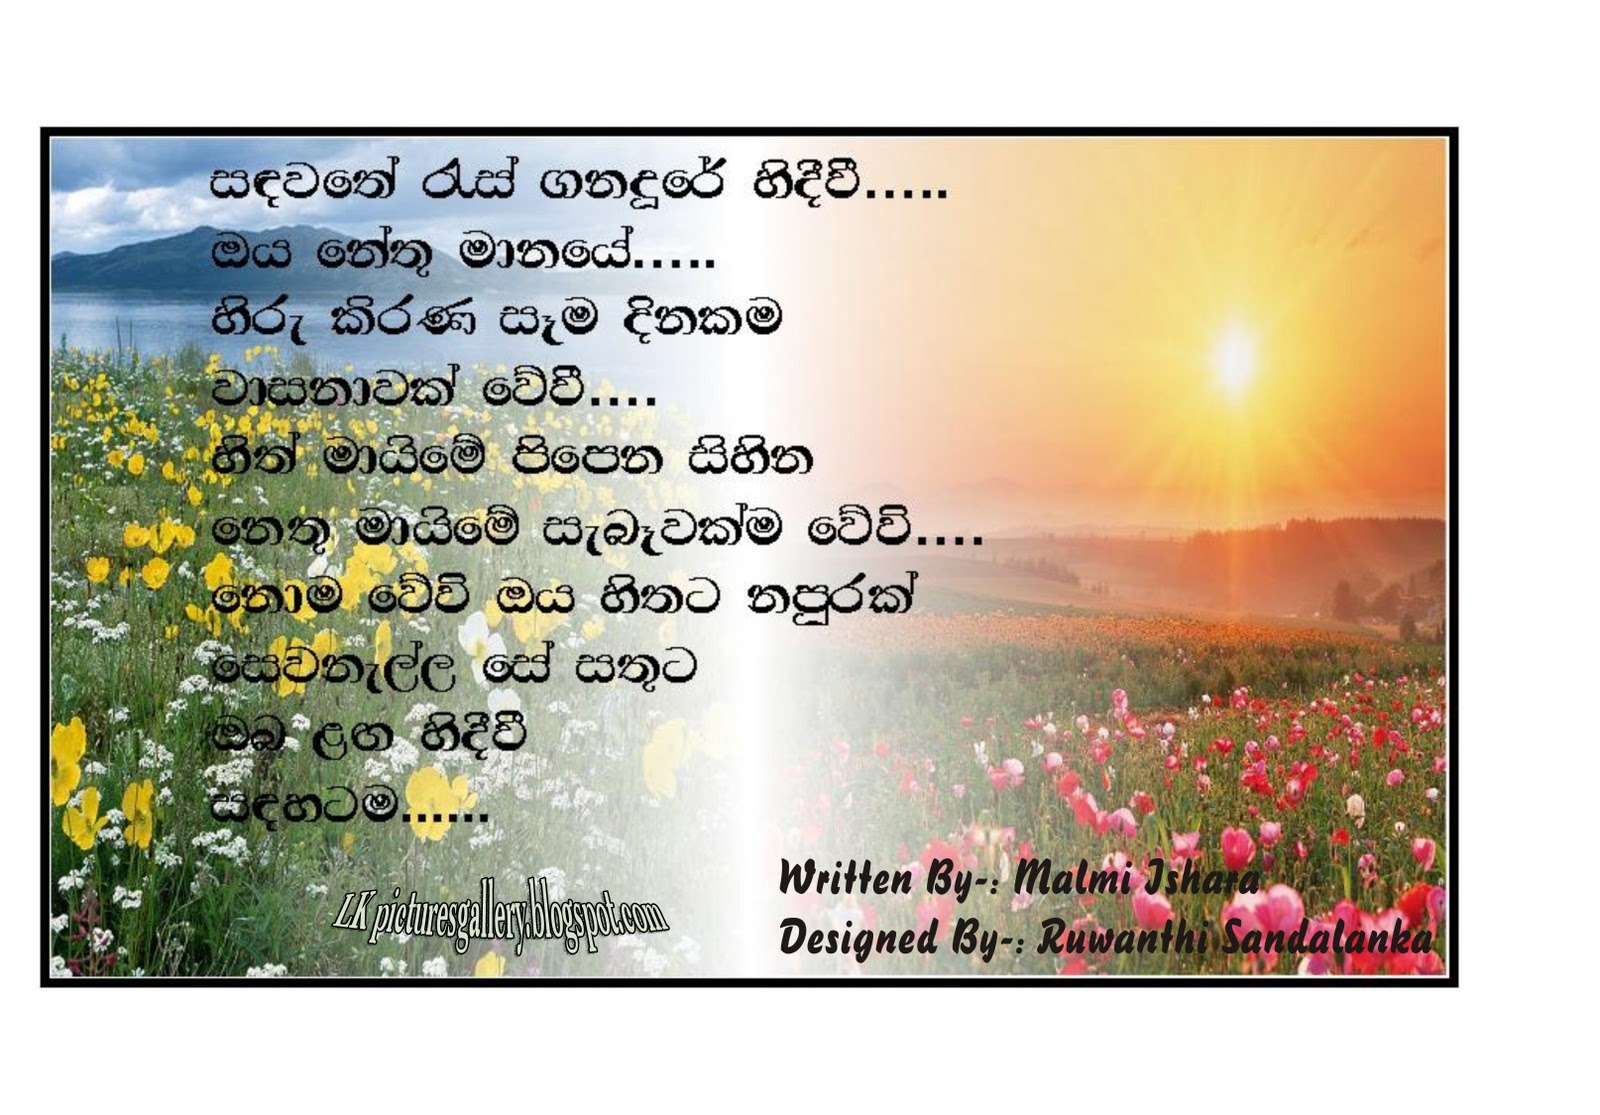 Love Wallpapers Sinhala : Search Results for ?Adara Nisadas? calendar 2015